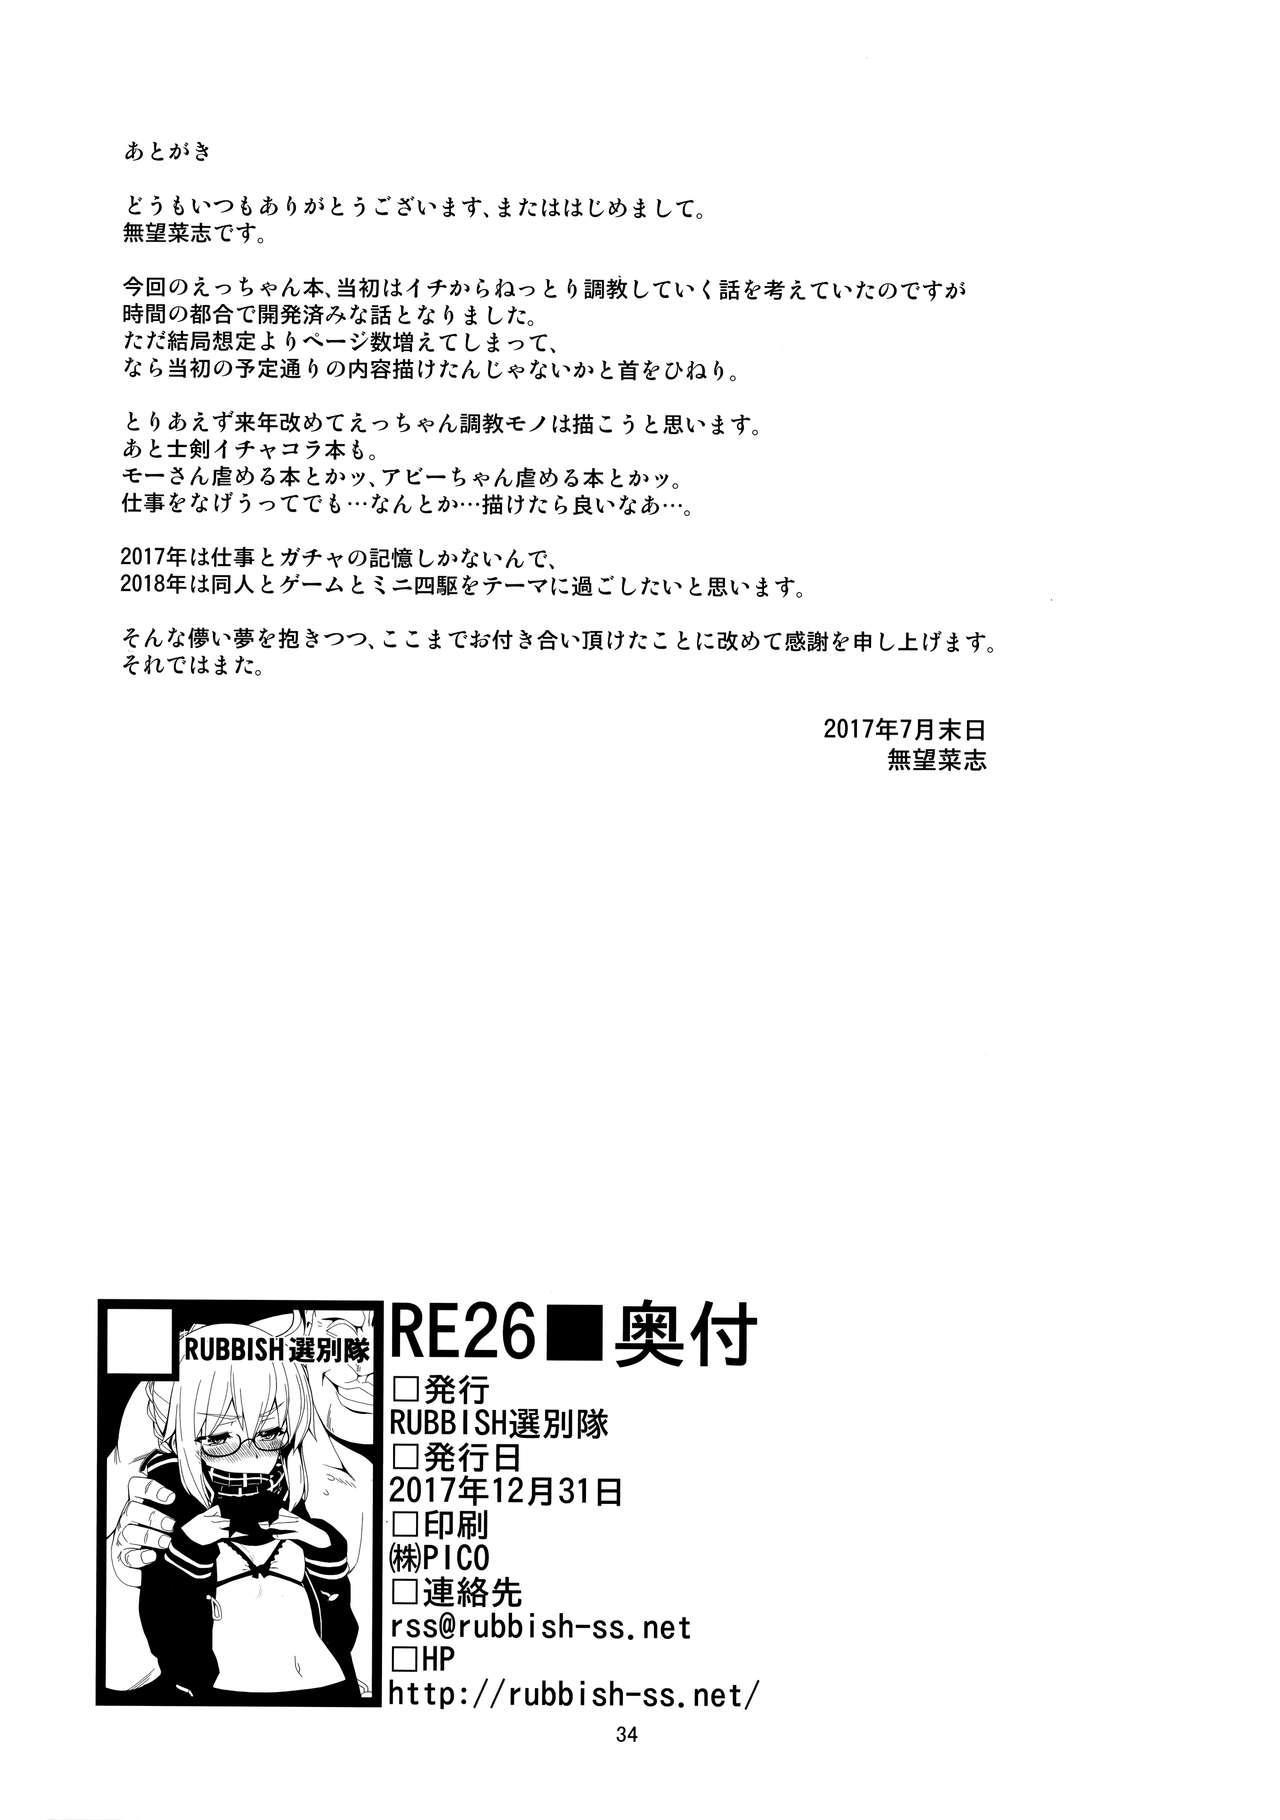 RE26 33